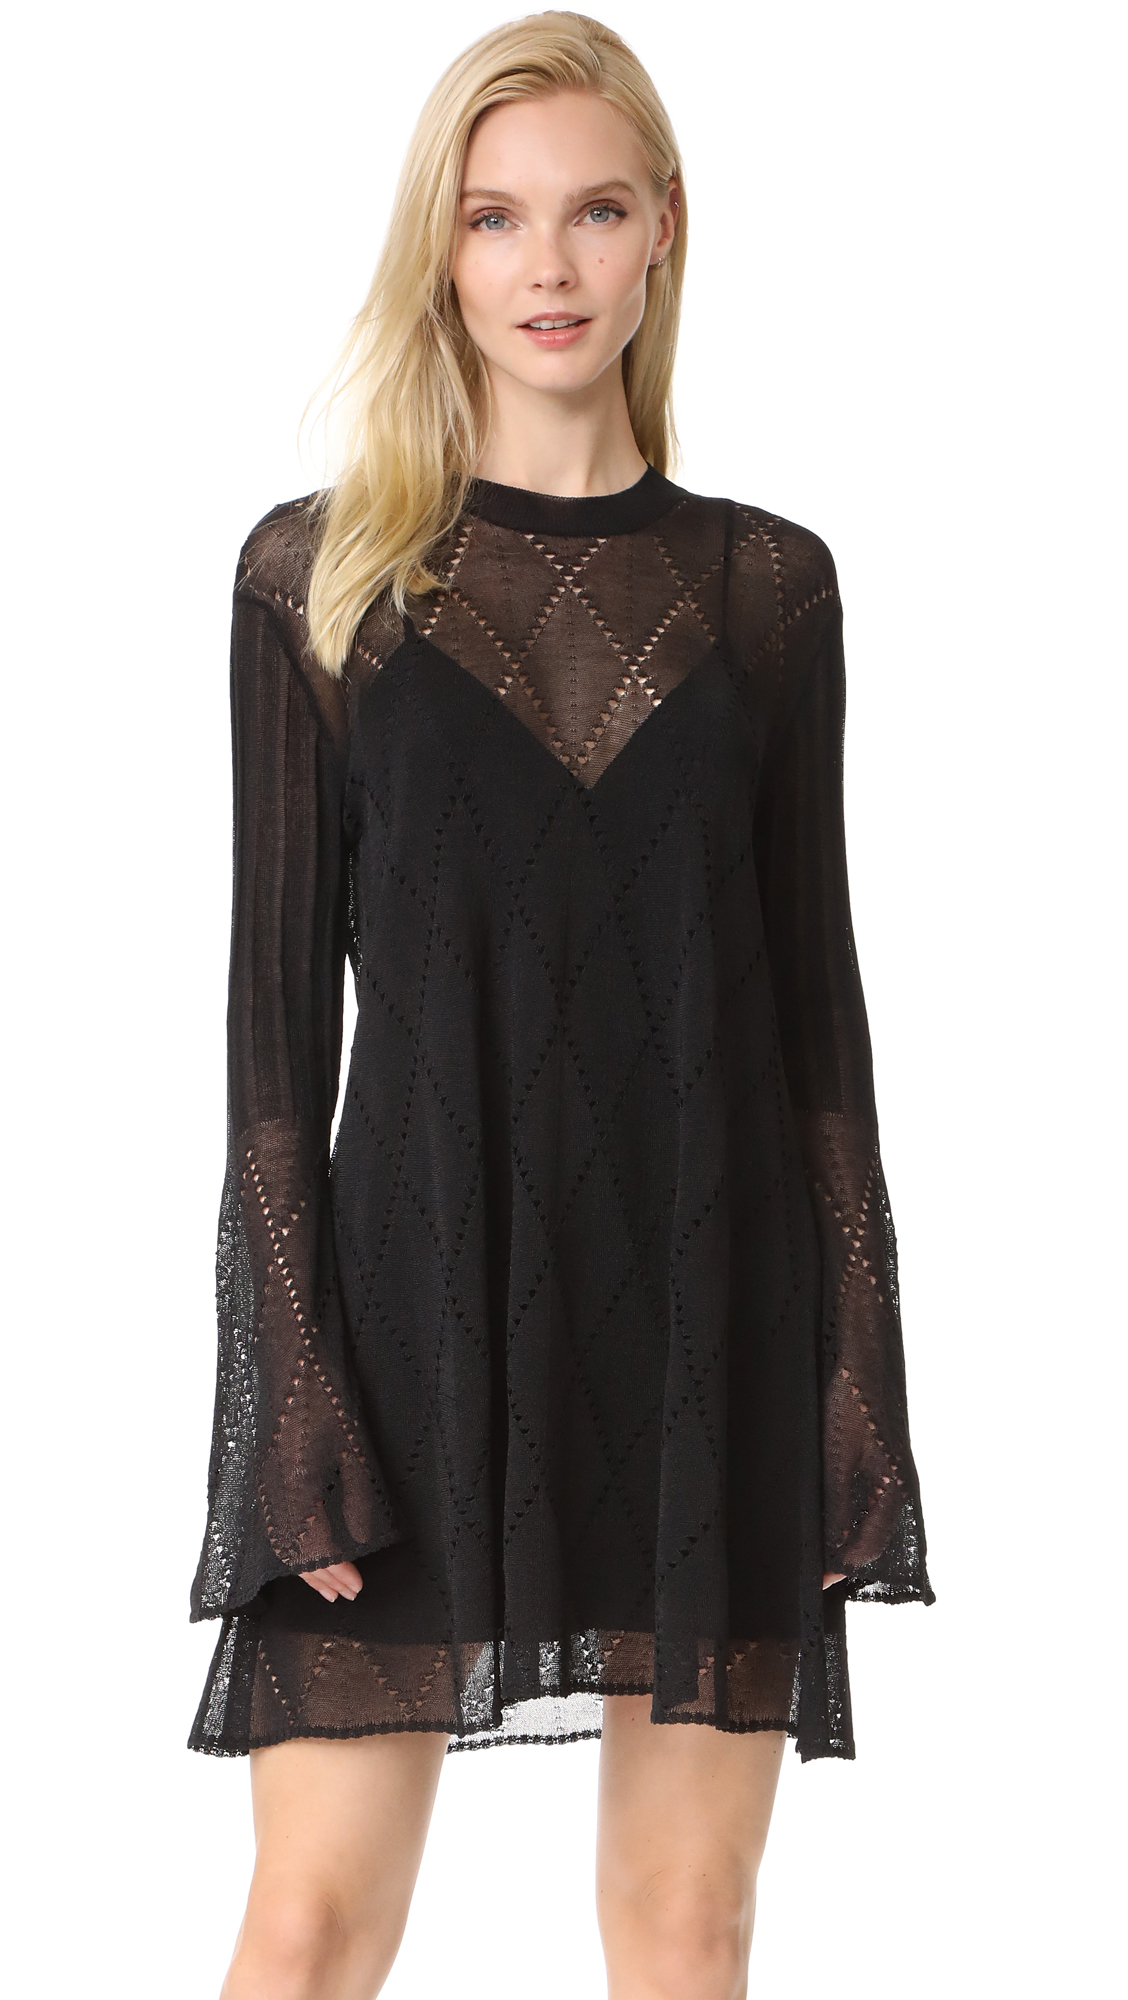 McQ - Alexander McQueen Lace Stripe Flared Dress - Darkest Black